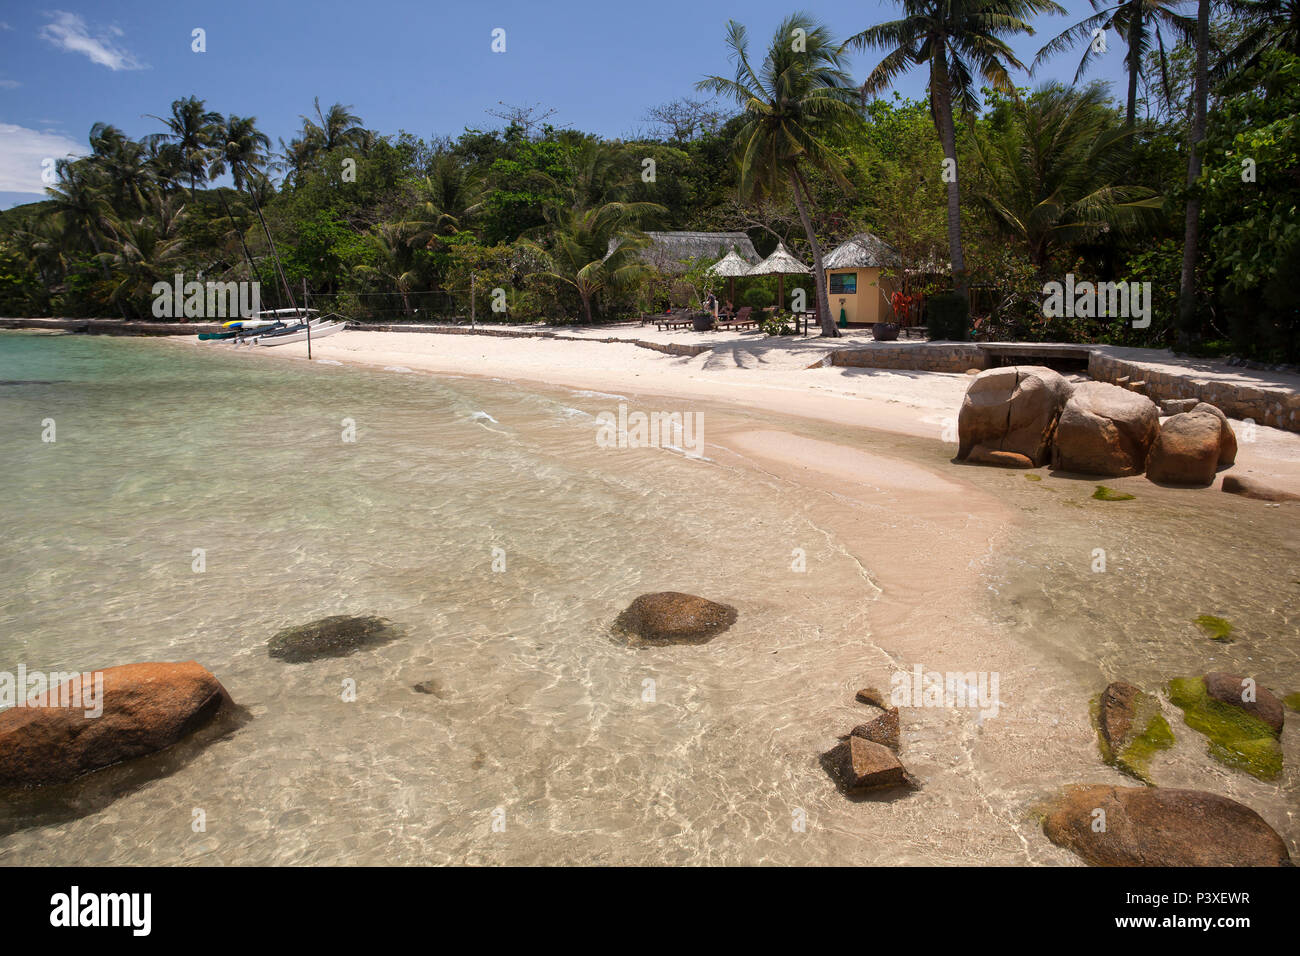 Insel Hong Ong, Whale island,Bucht von Nha Trang,Vietnam, Asien - Stock Image